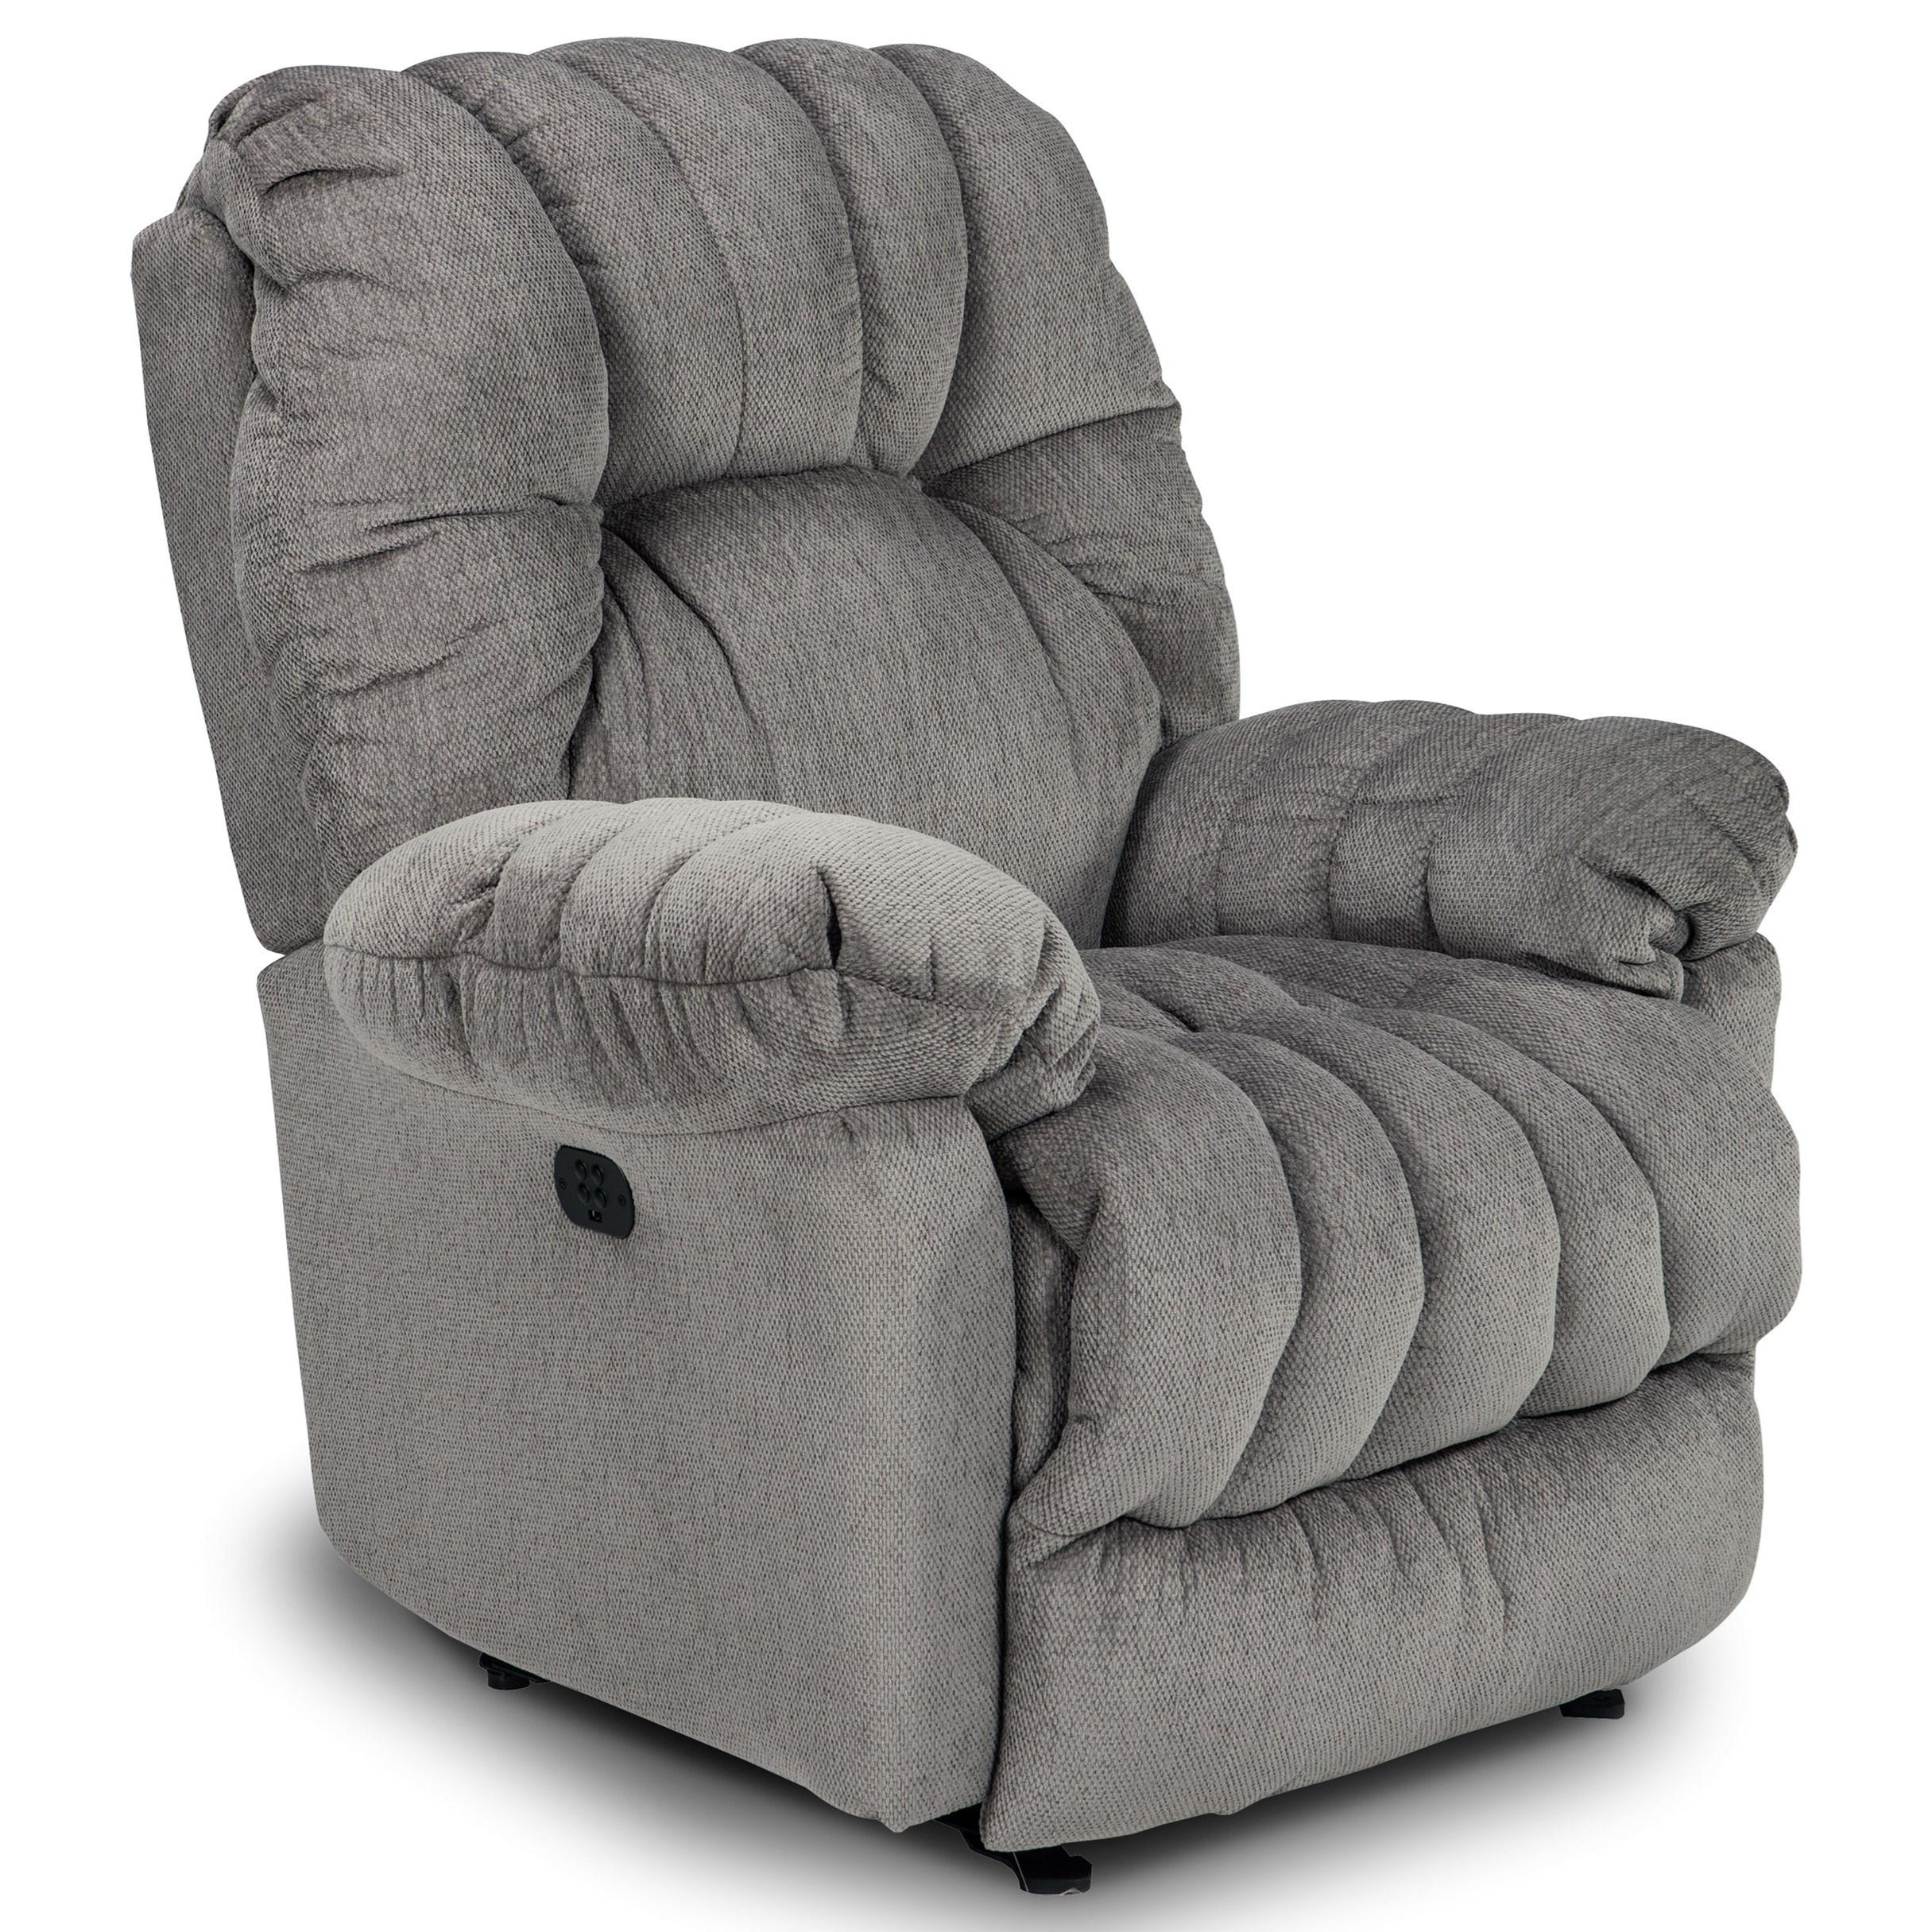 Best Home Furnishings Medium Recliners Conen Rocking Reclining Chair